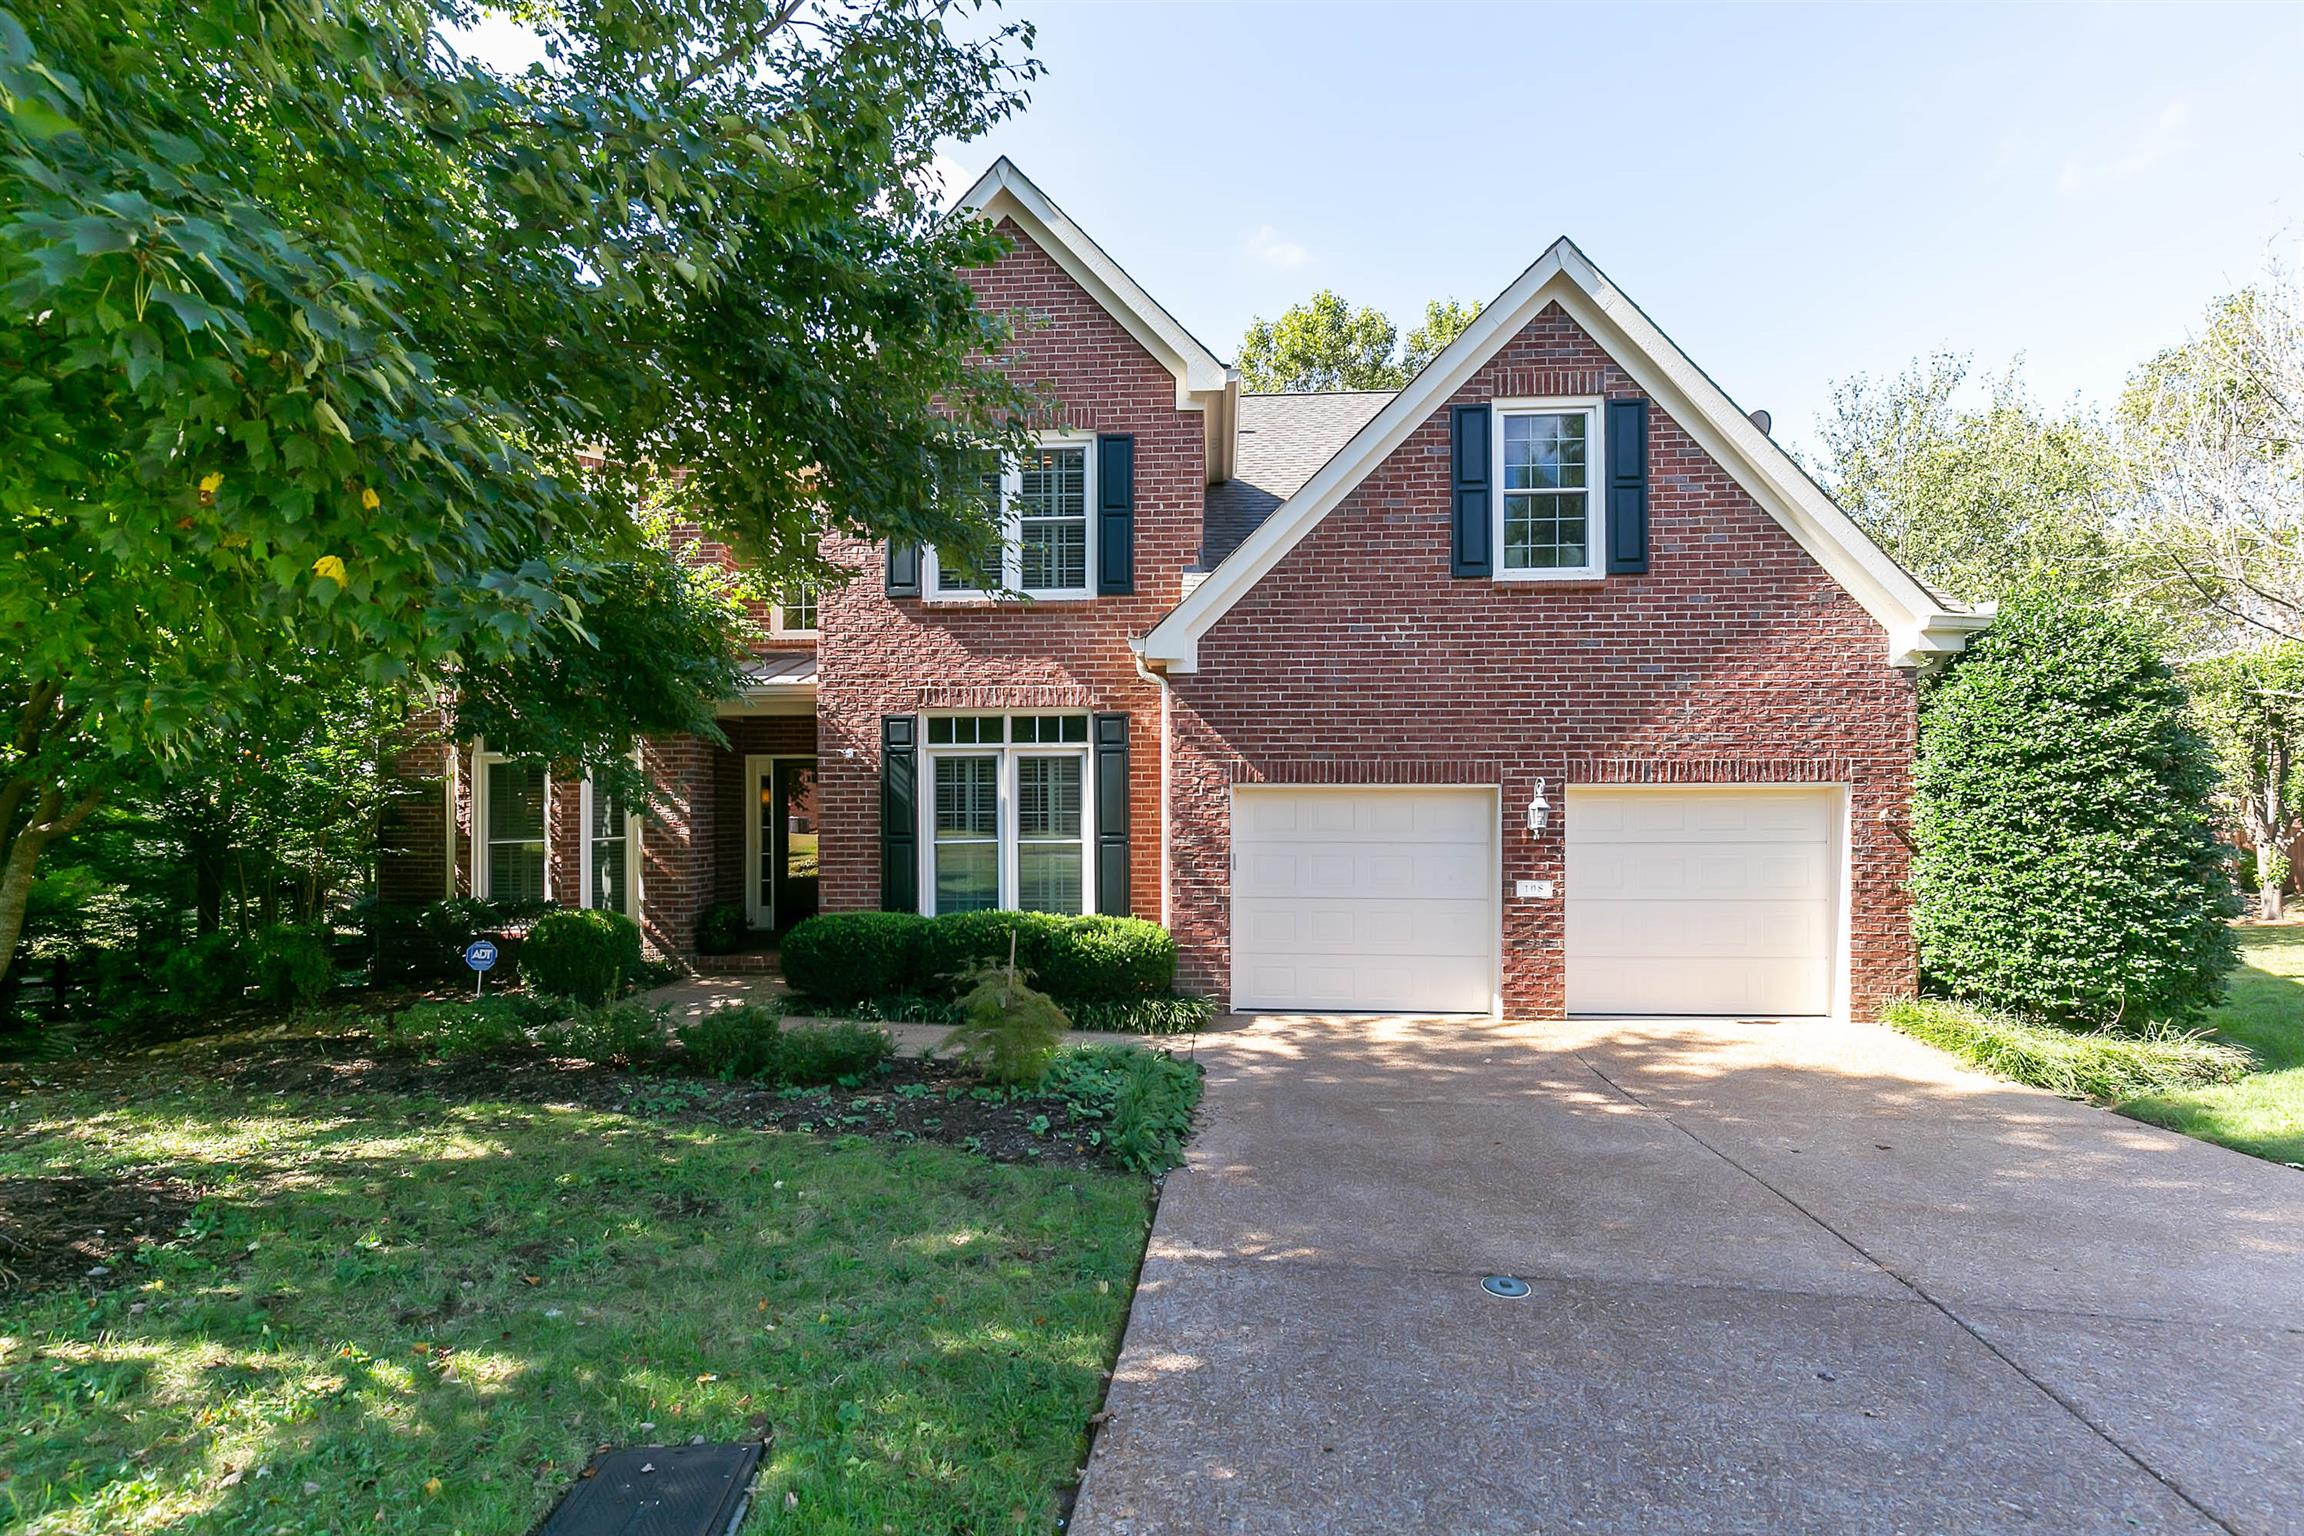 108 Shepards Sq, Nashville, TN 37211 - Nashville, TN real estate listing